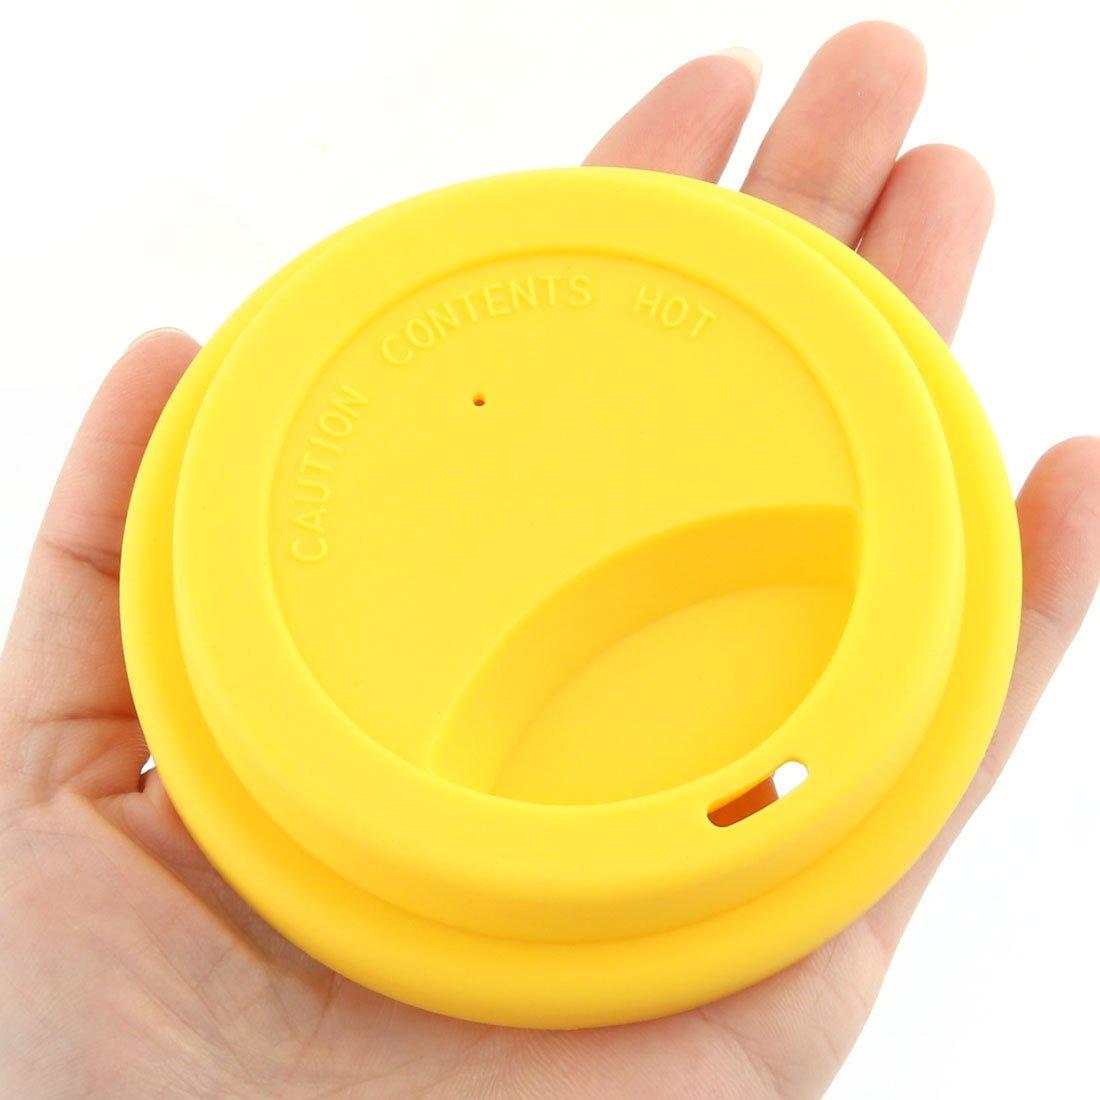 Amazon.com: eDealMax Familia de silicona reutilizable café que Bebe té tapa Taza agua Taza de la cubierta amarilla: Health & Personal Care